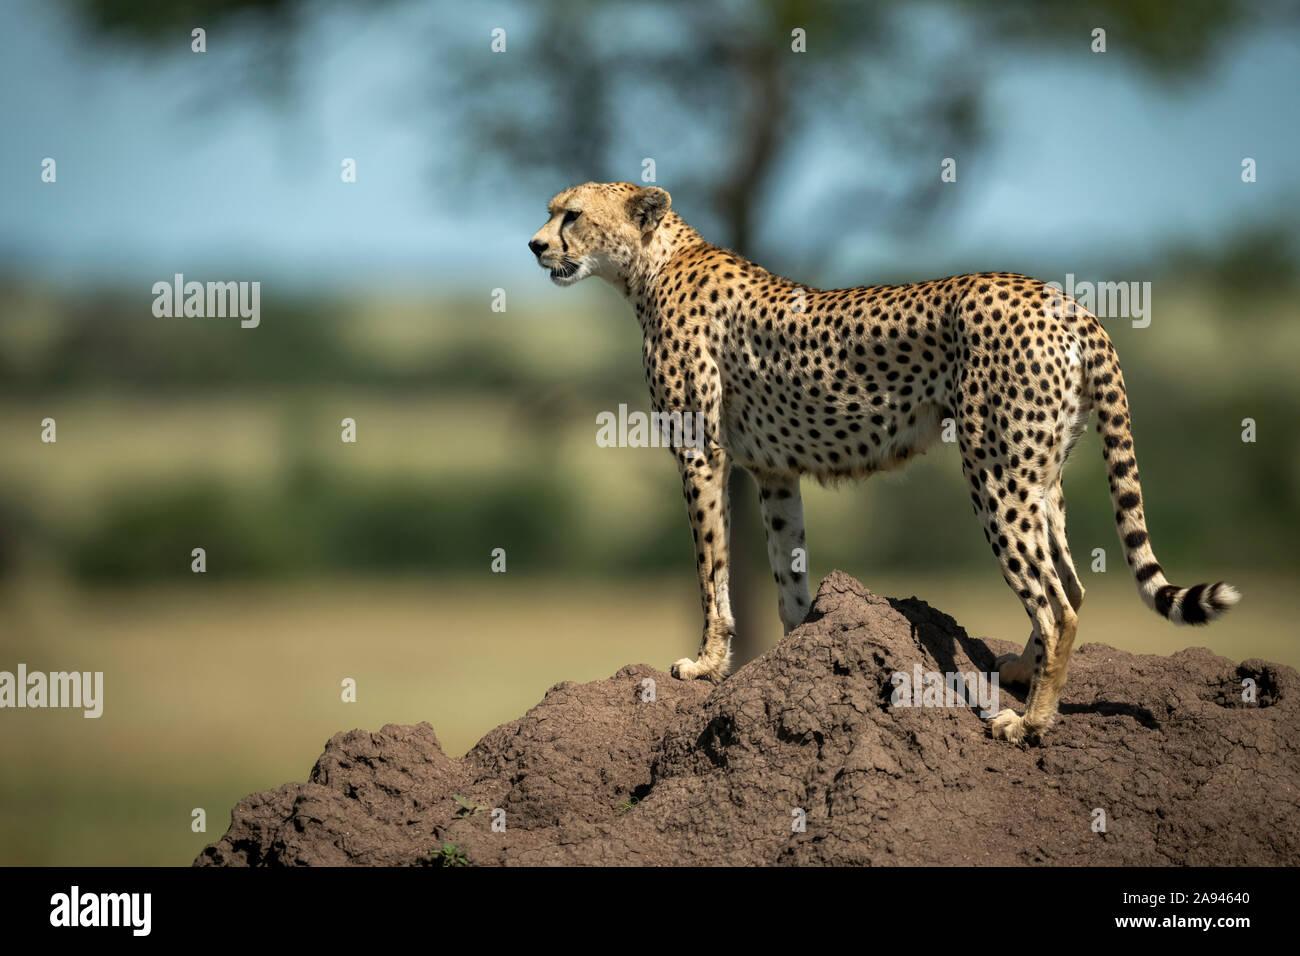 Cheetah (Acinonyx jubatus) stands on termite mound in profile, Grumeti Serengeti Tented Camp, Serengeti National Park; Tanzania Stock Photo